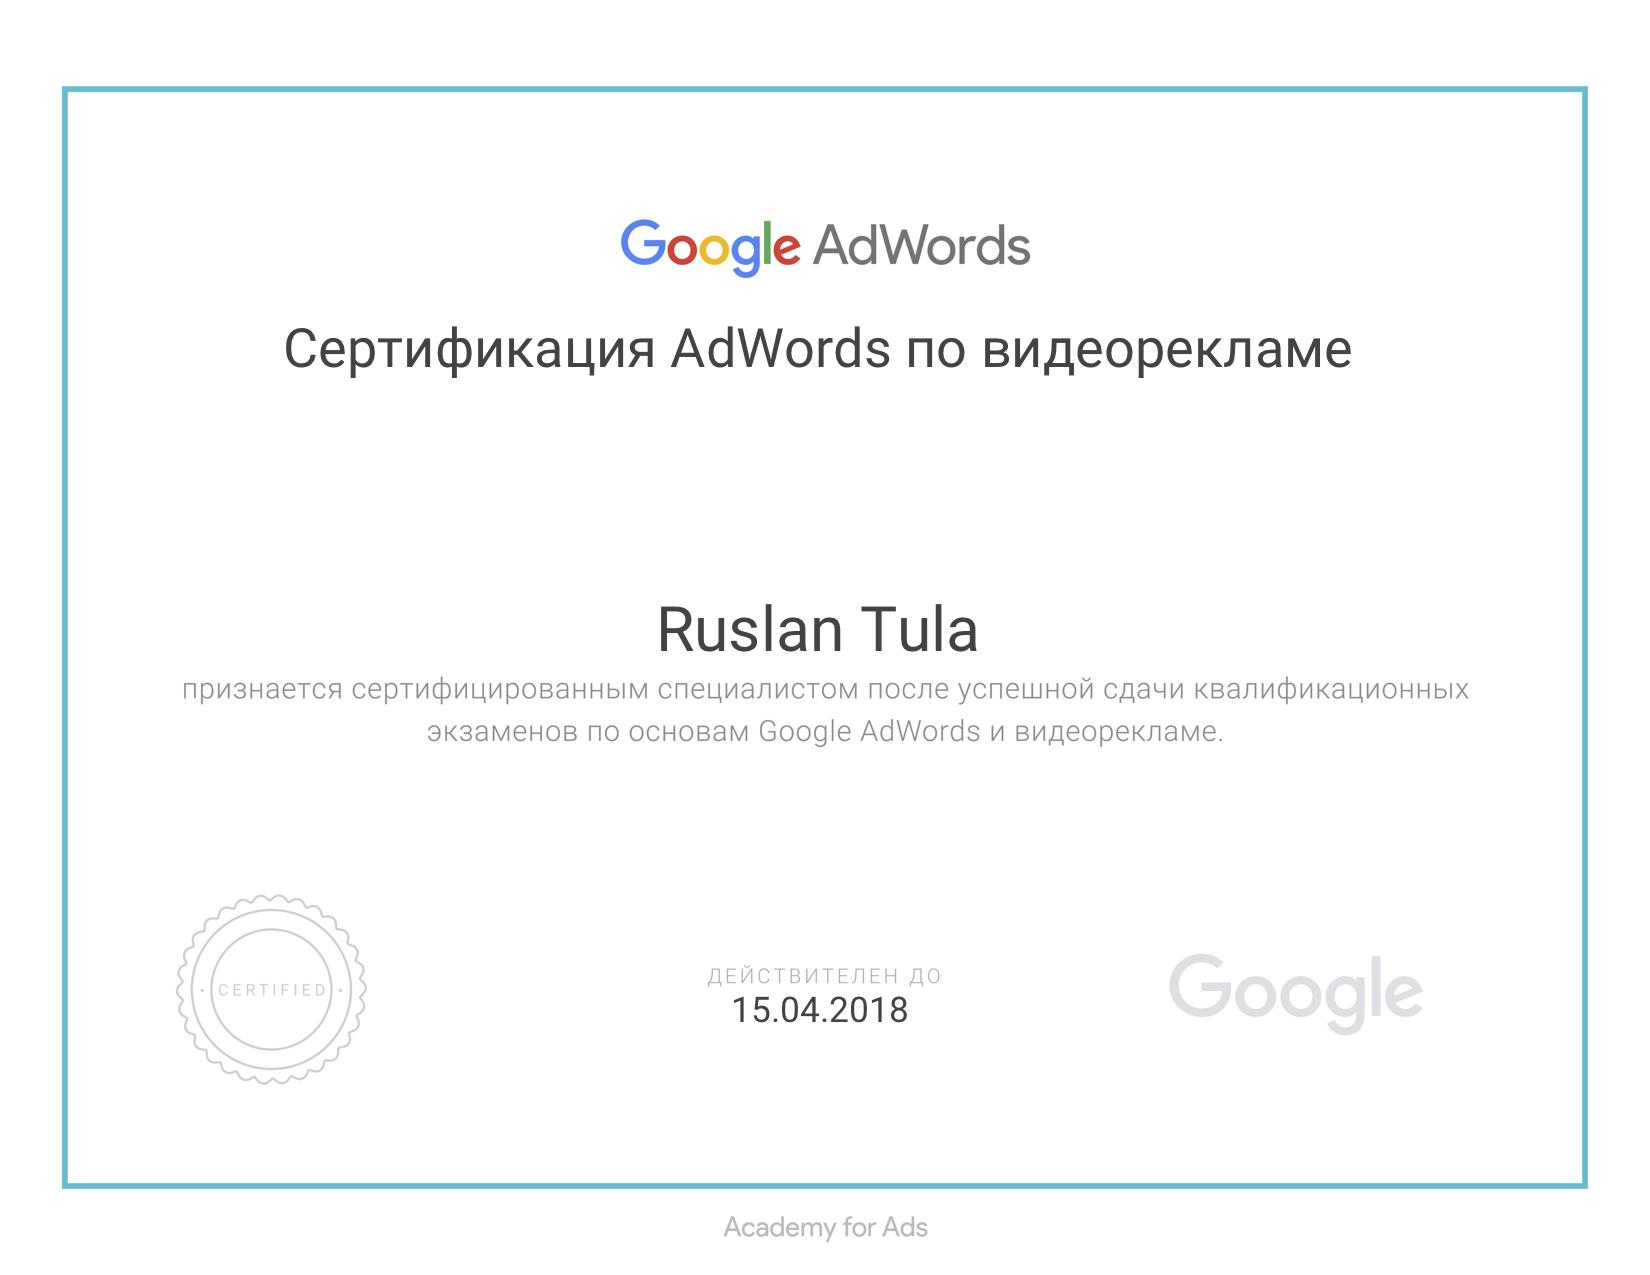 Сертификация Google Adwords по Видеорекламе (Youtube)